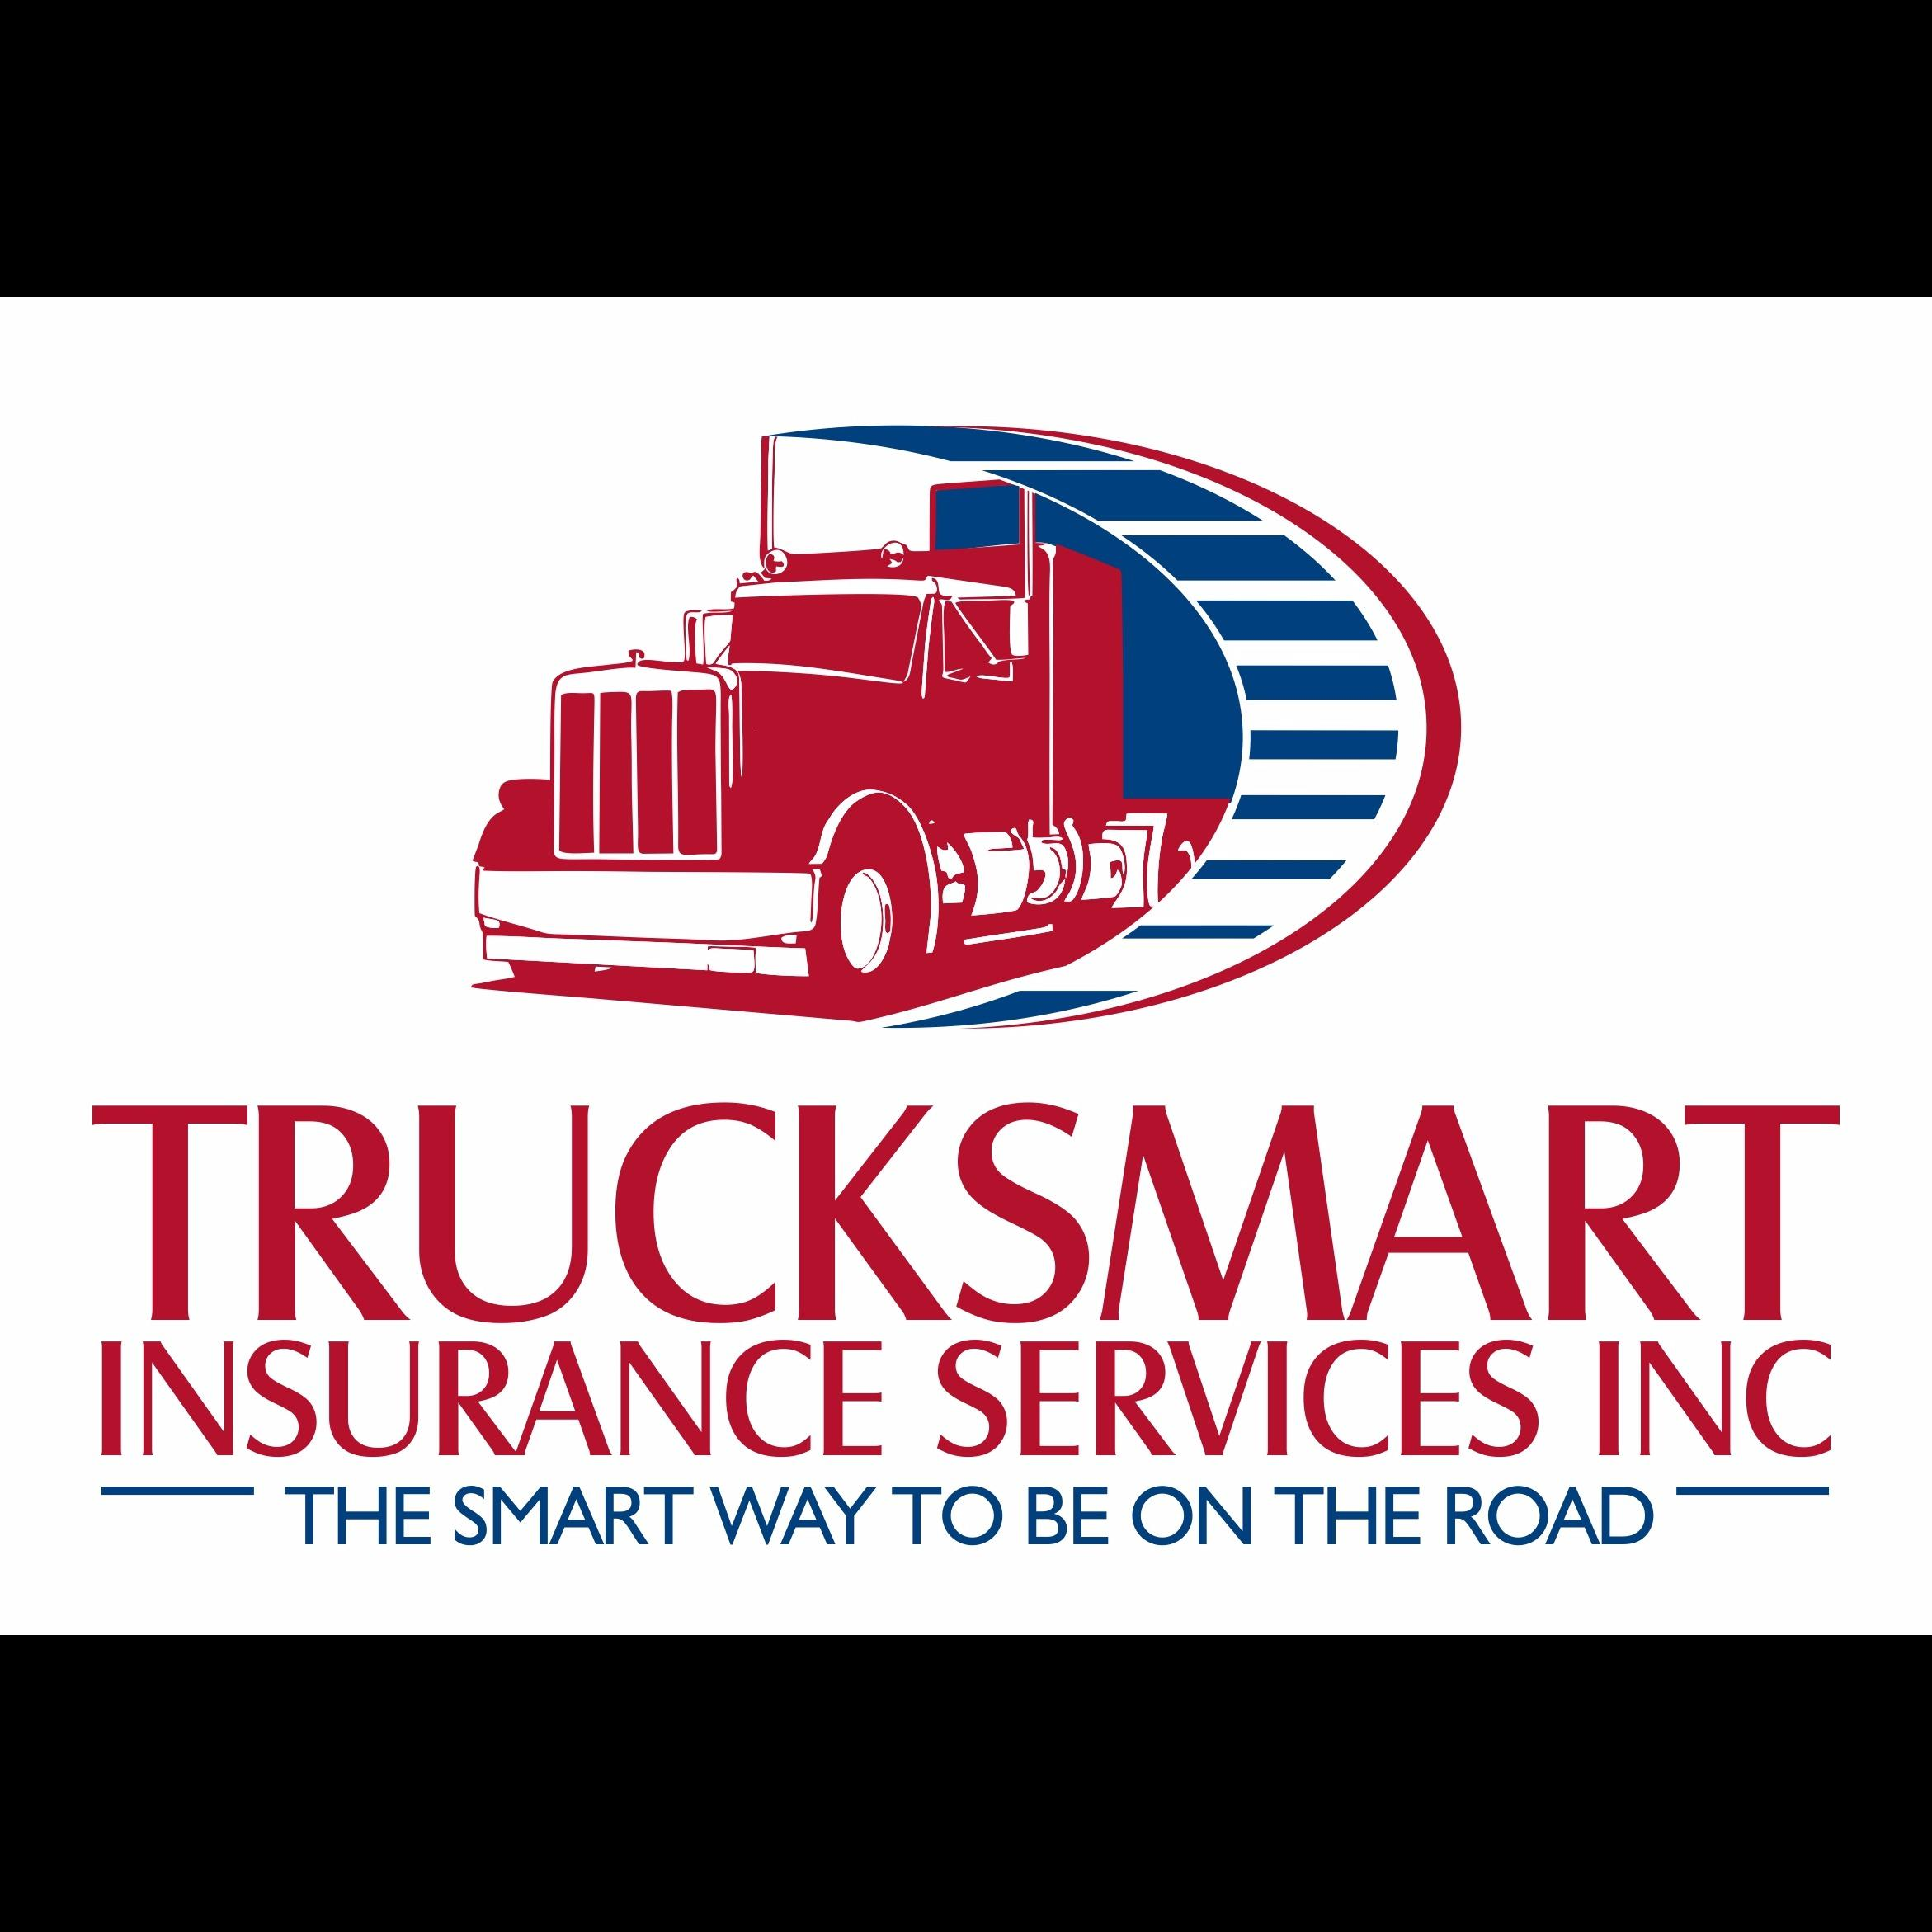 Trucksmart Insurance Services Inc.